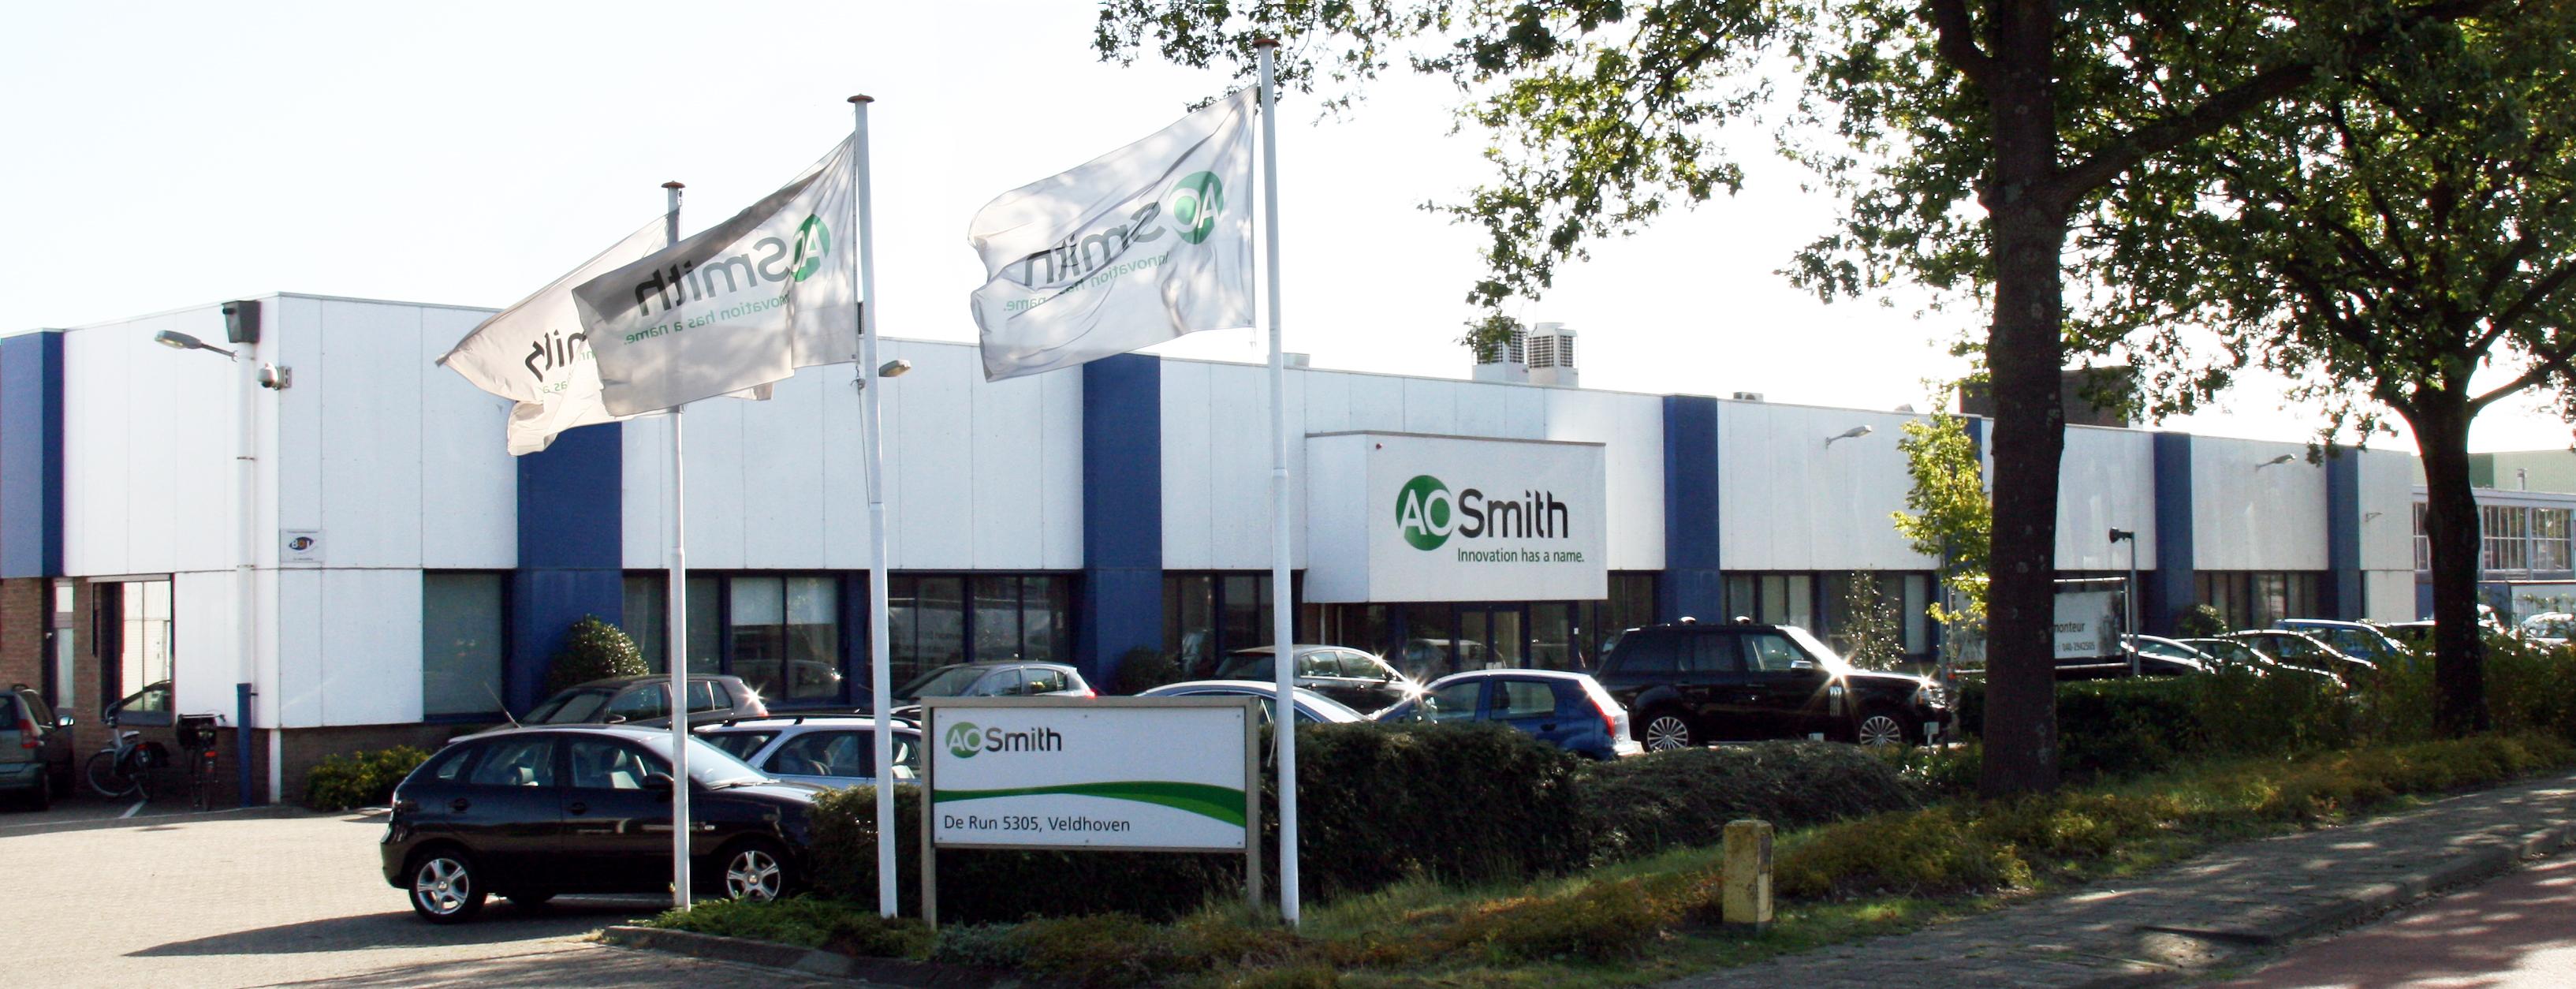 A  O  Smith - Wikipedia